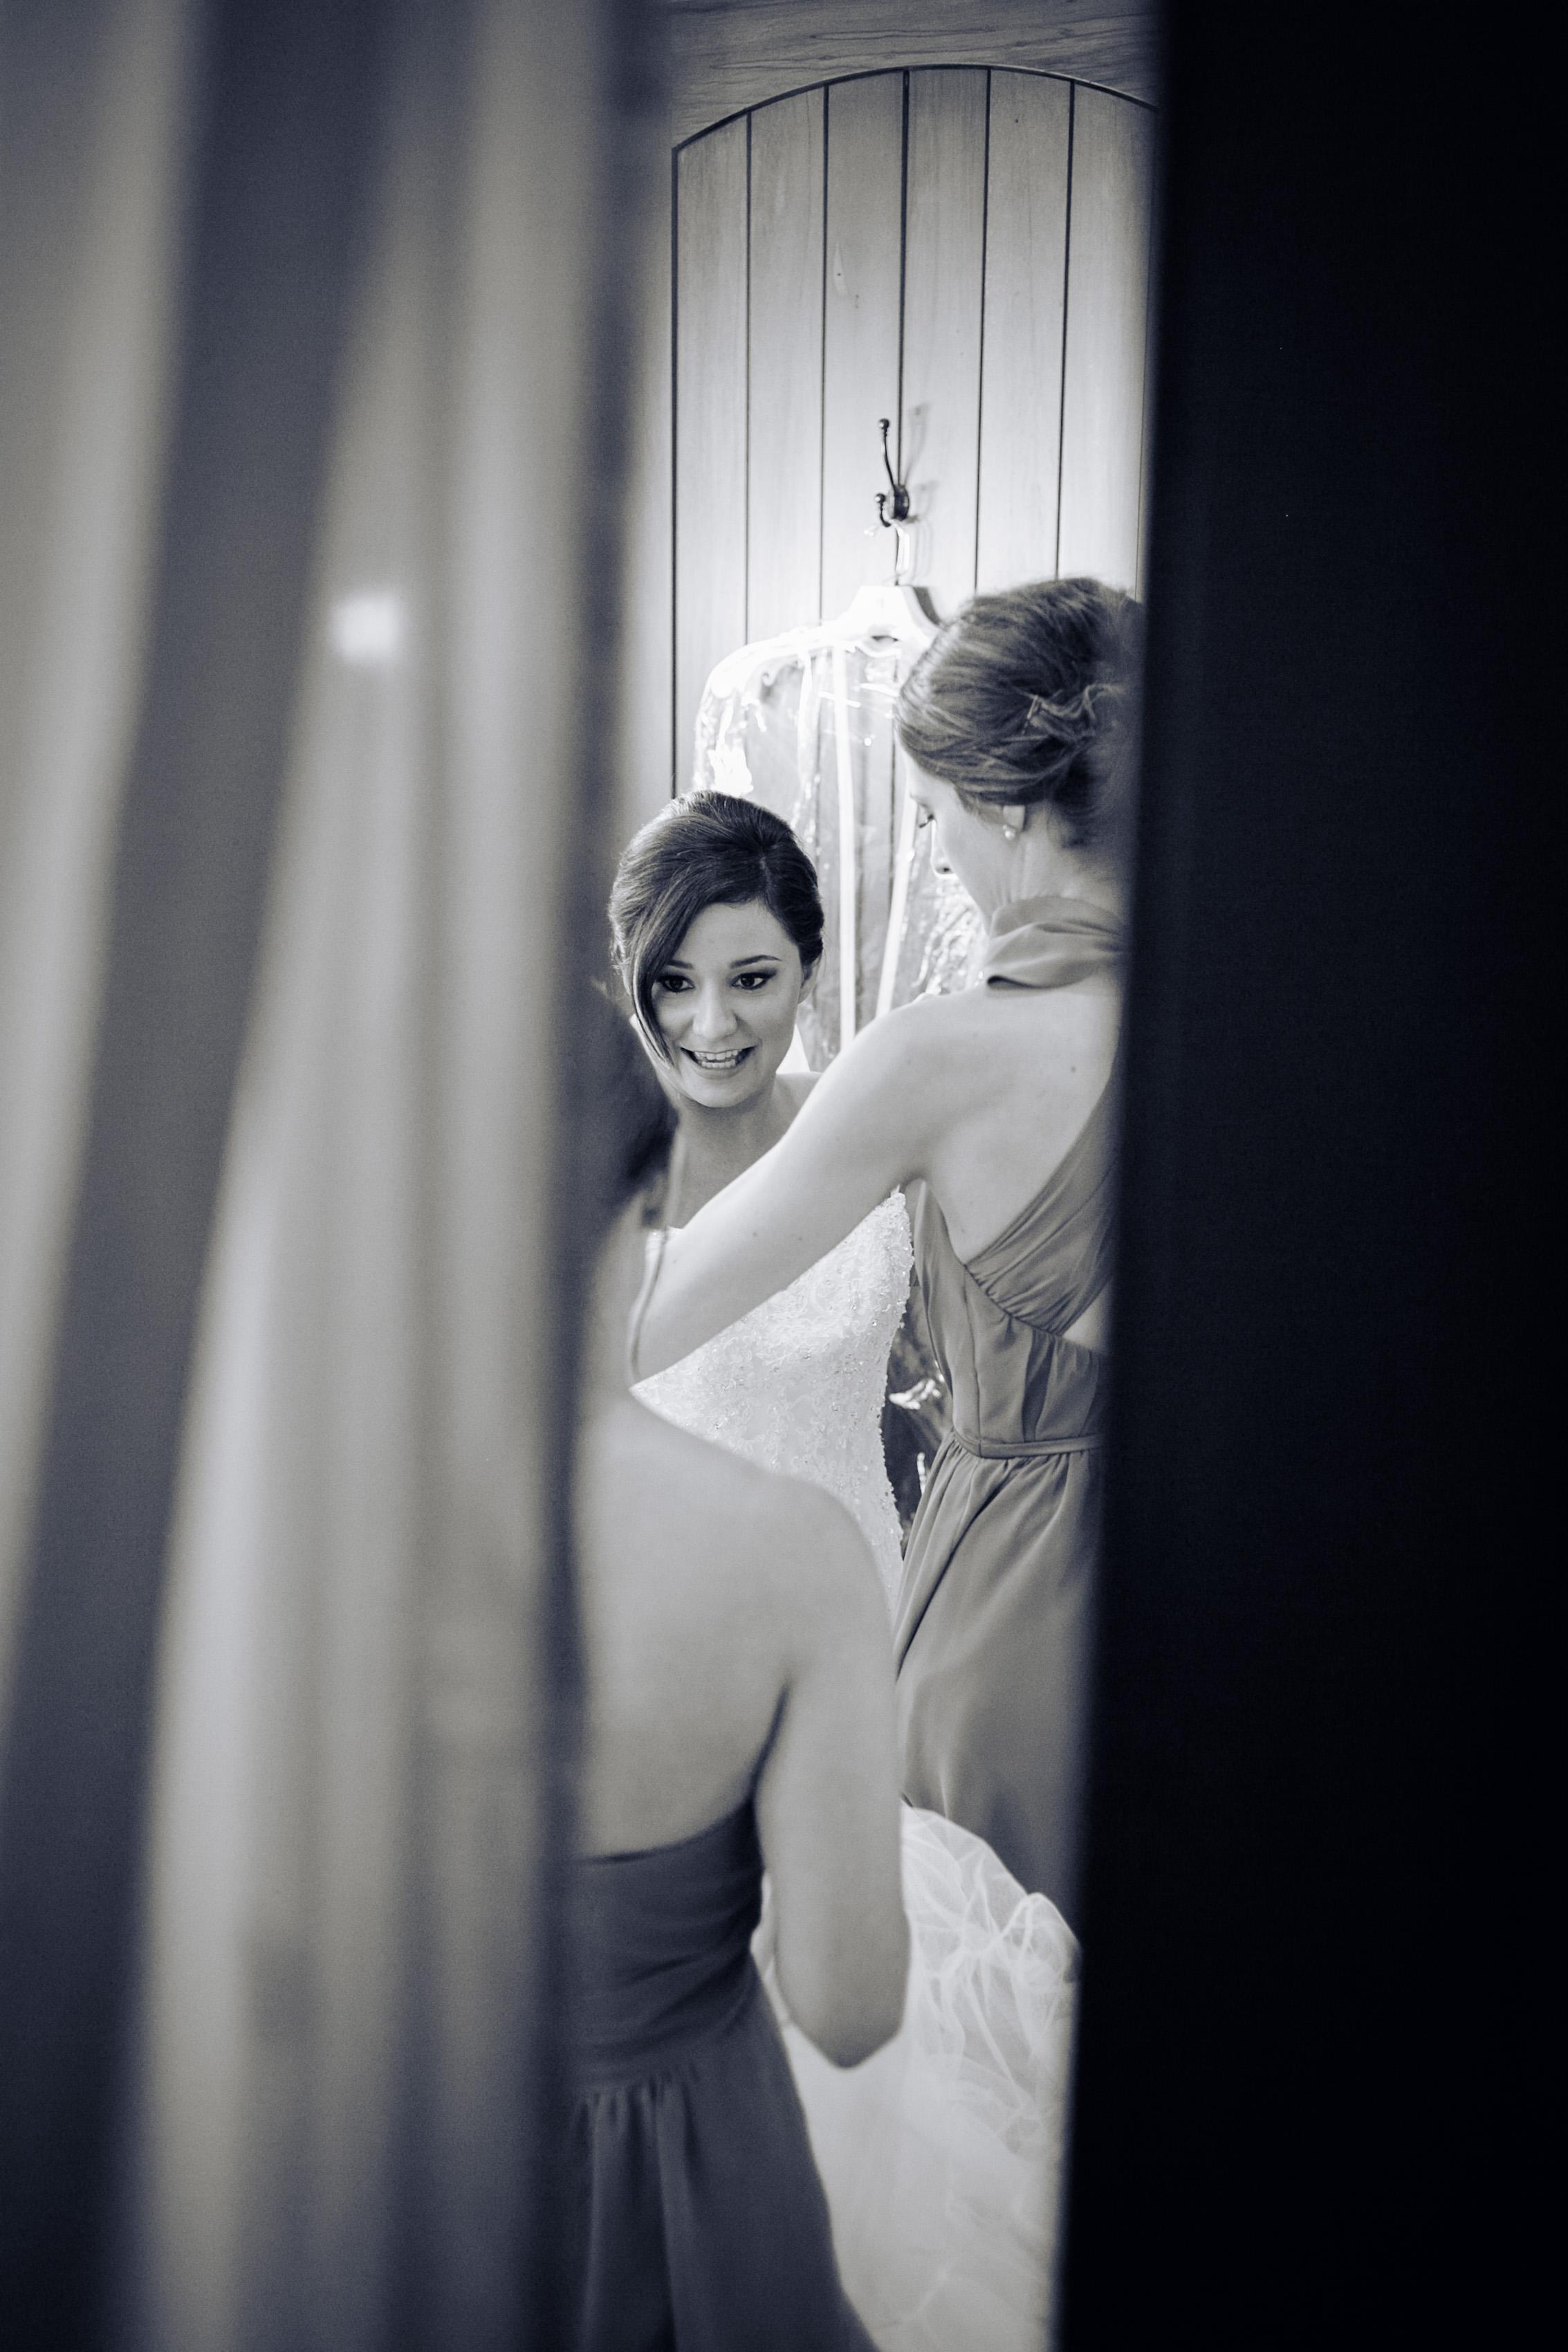 bridesmaid + bride getting ready shots